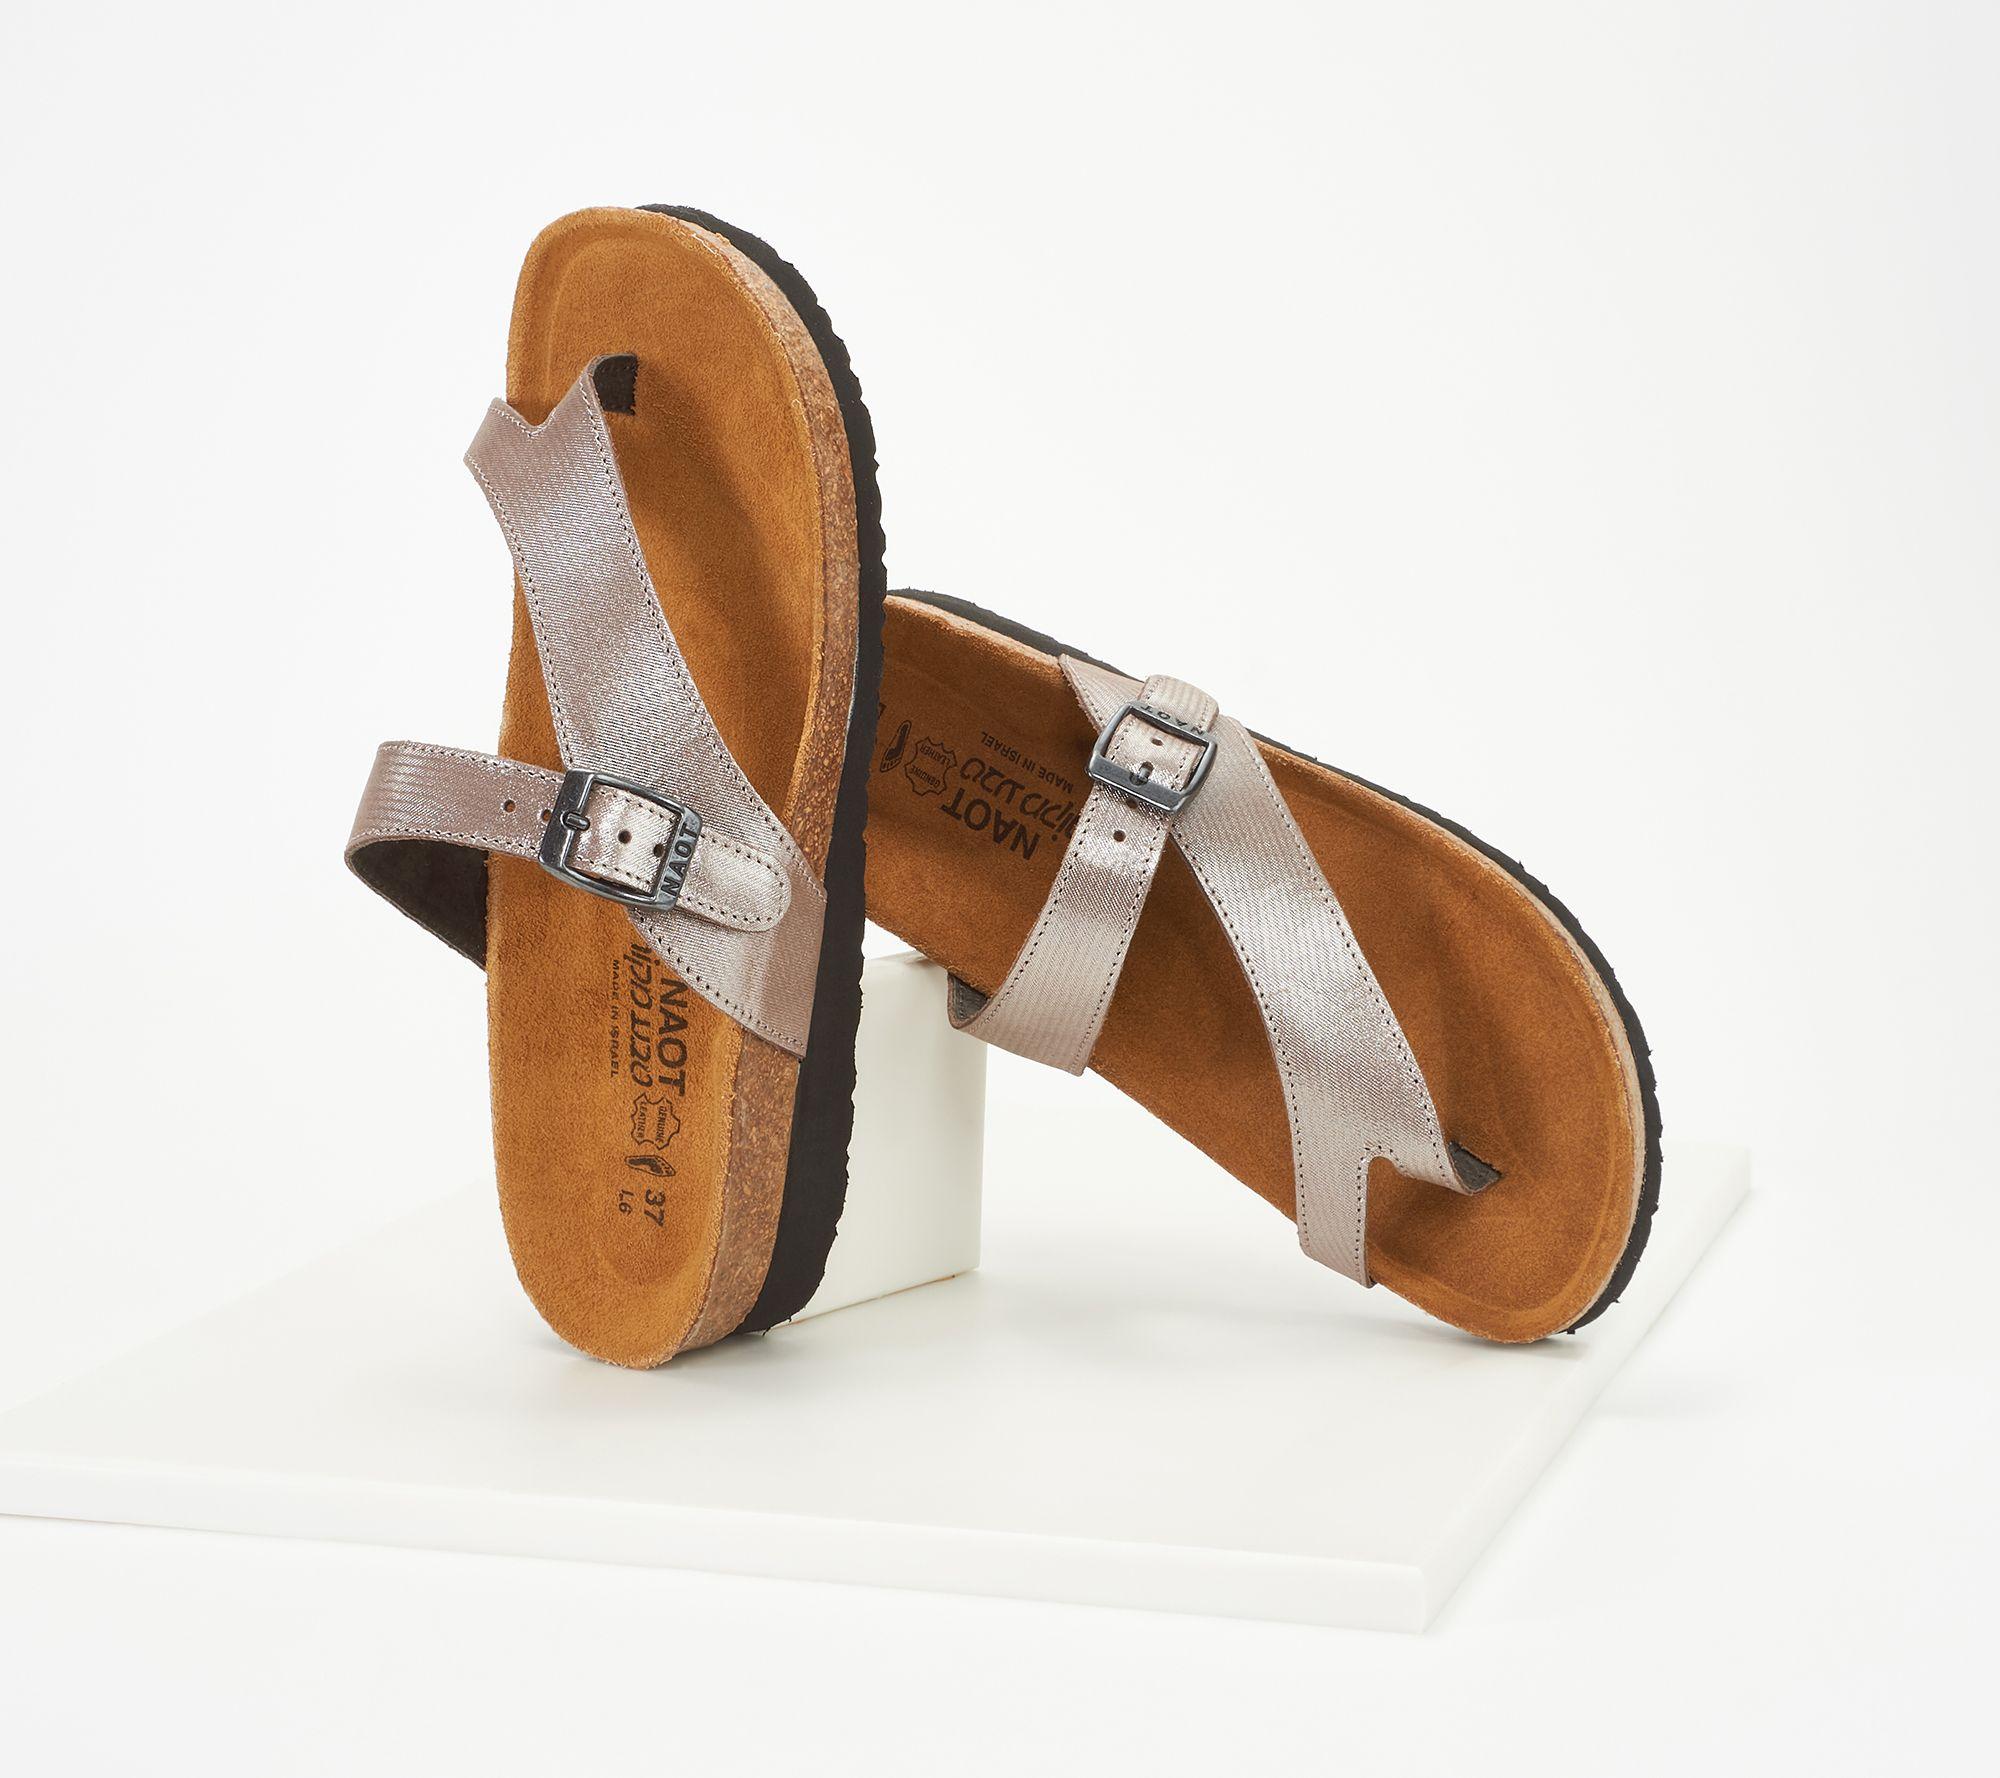 f3a1f37daa90 Naot Leather Toe-Loop Slide Sandals - Tahoe - Page 1 — QVC.com